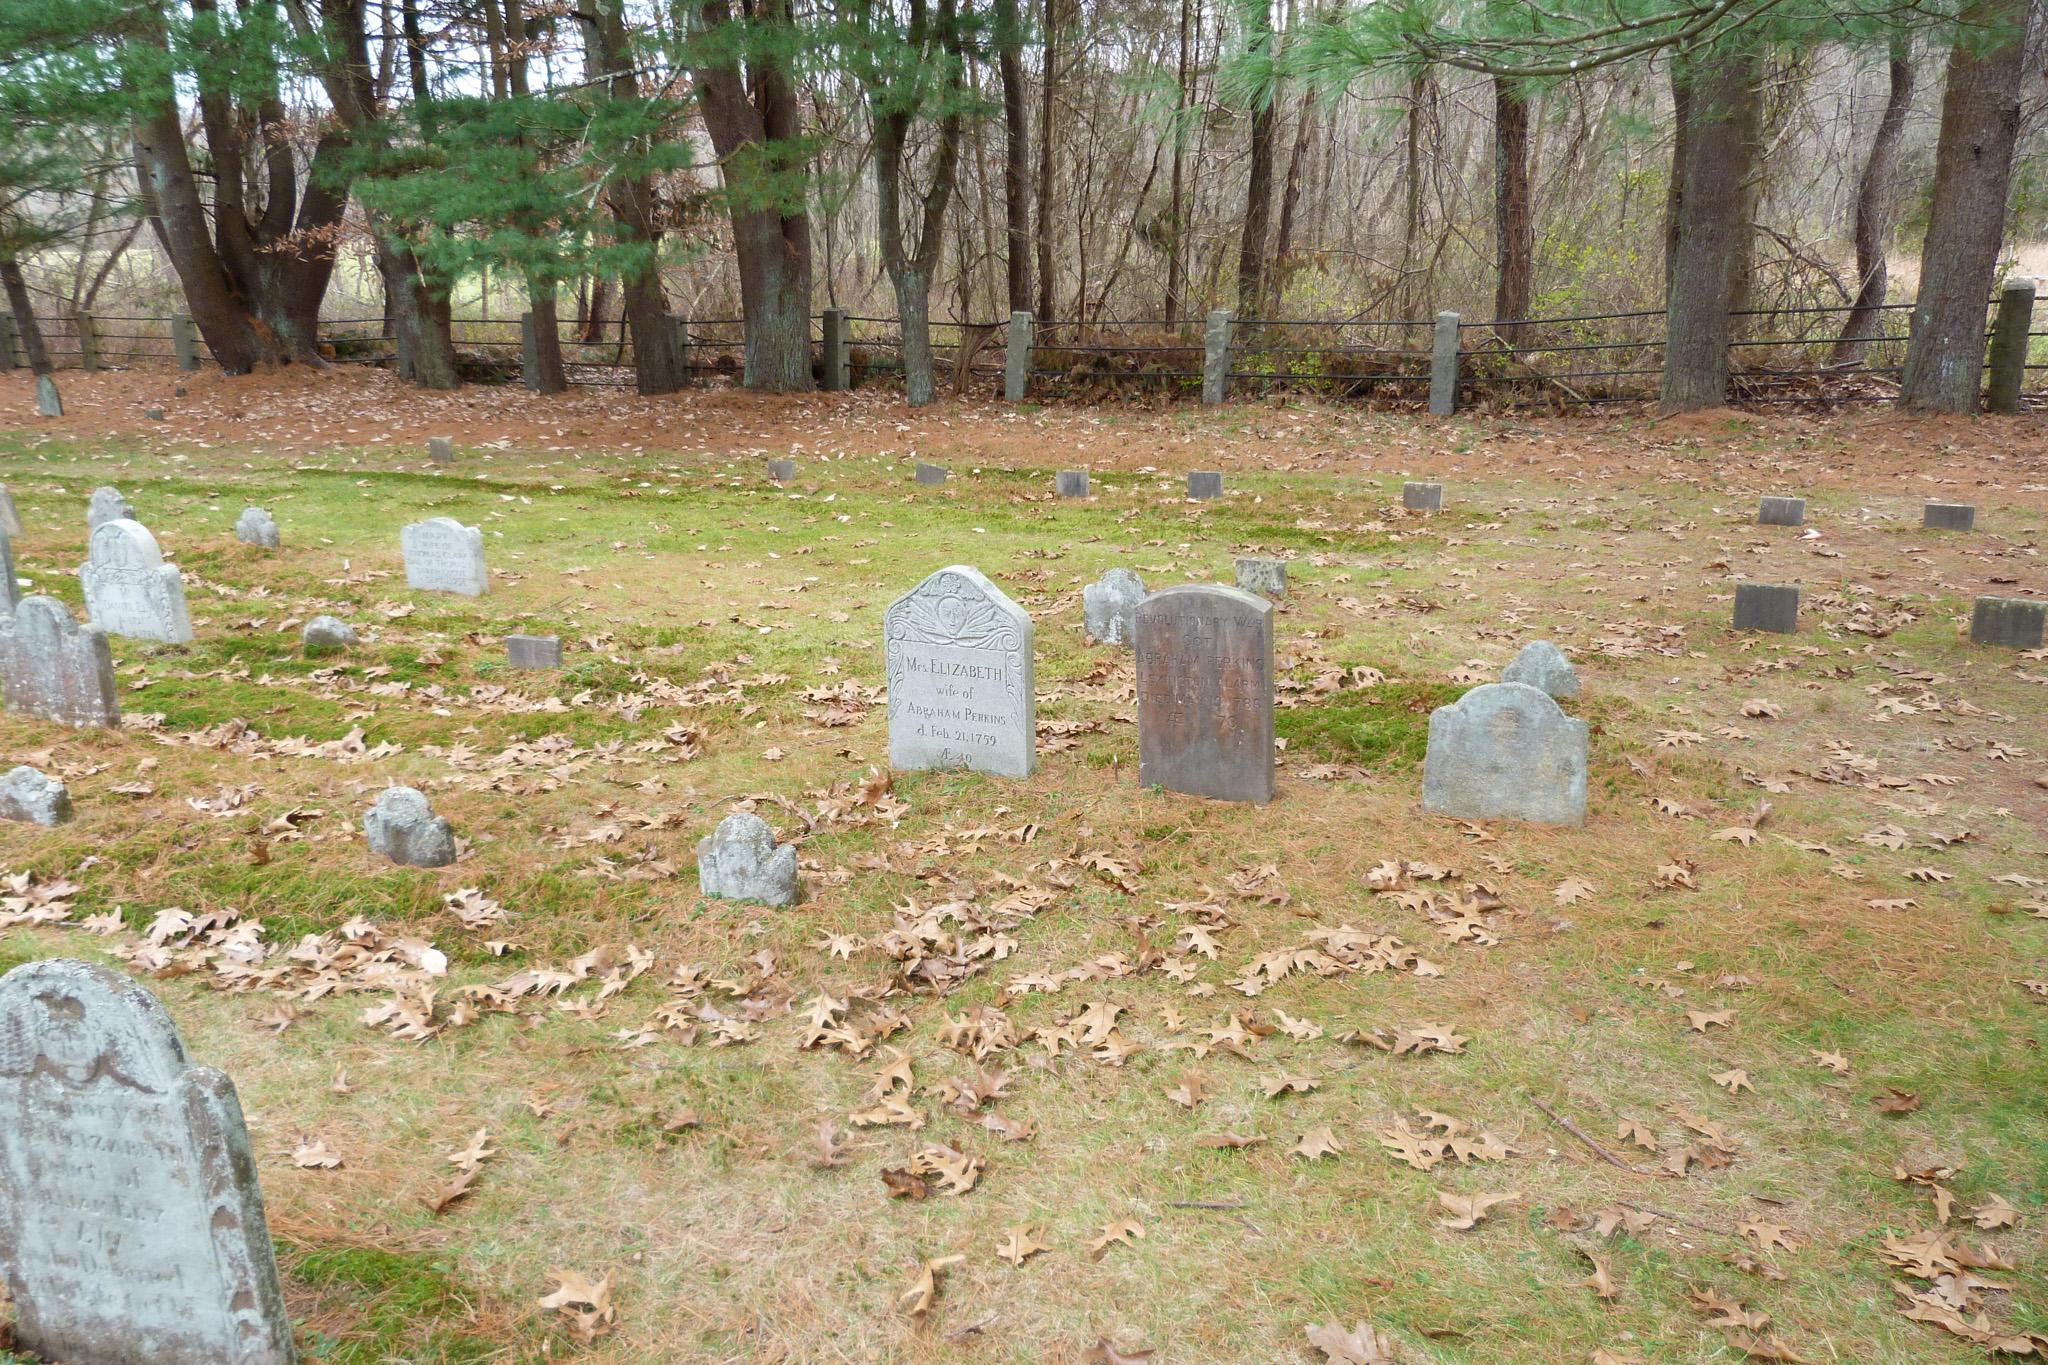 Perkins Family Gravesite in Ely Cemetery